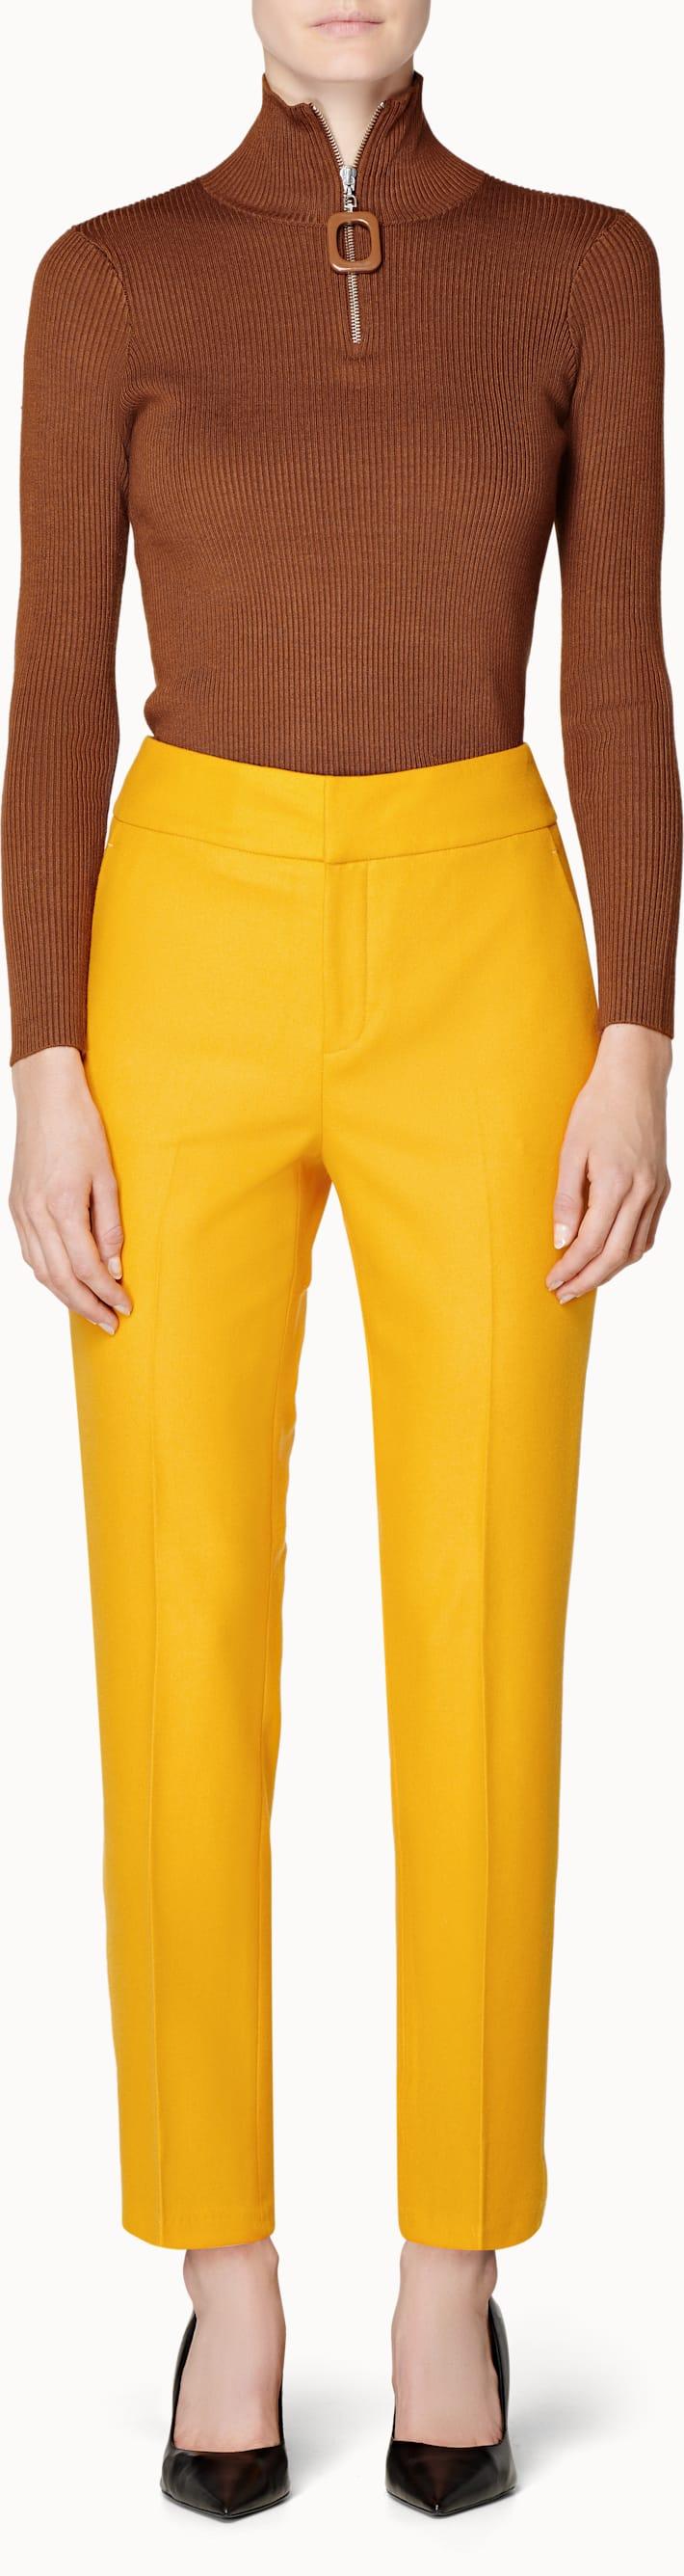 Cameron Sunshine Belted Suit